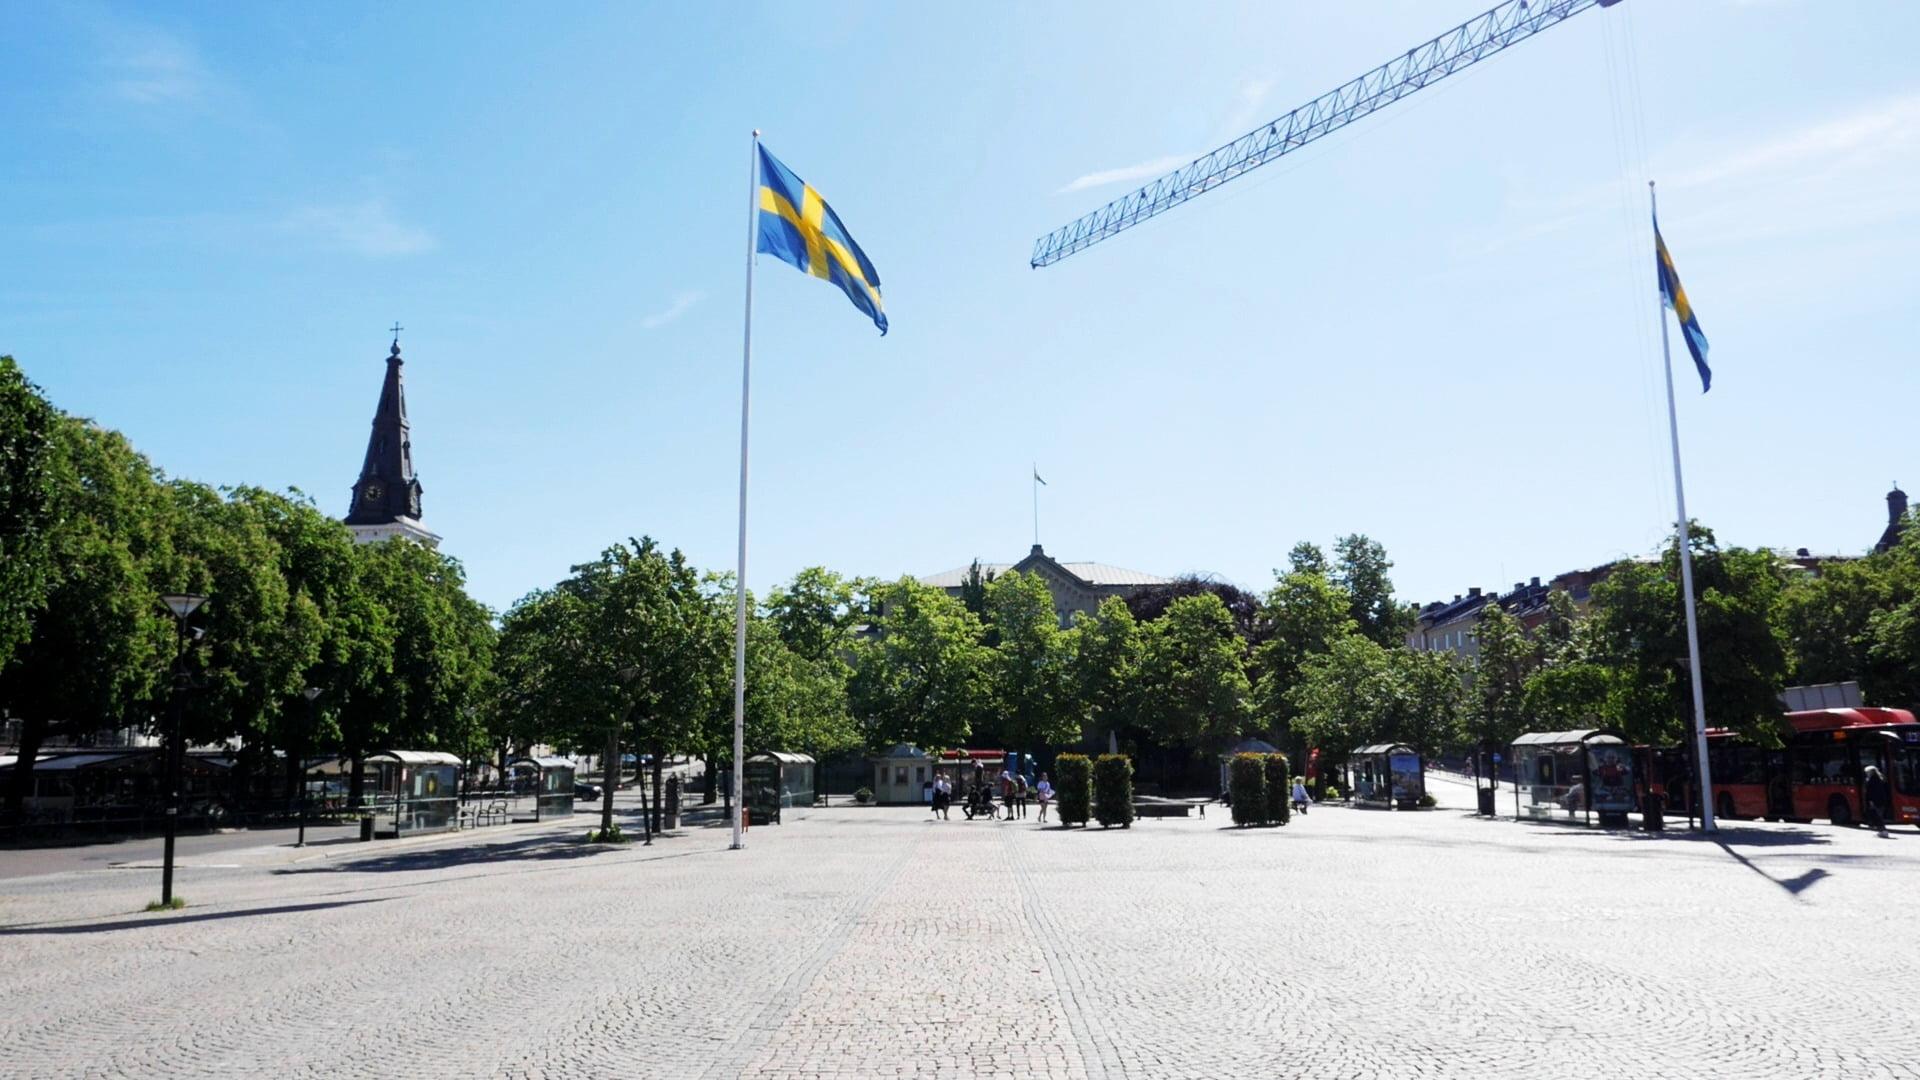 Karlstad Kommun